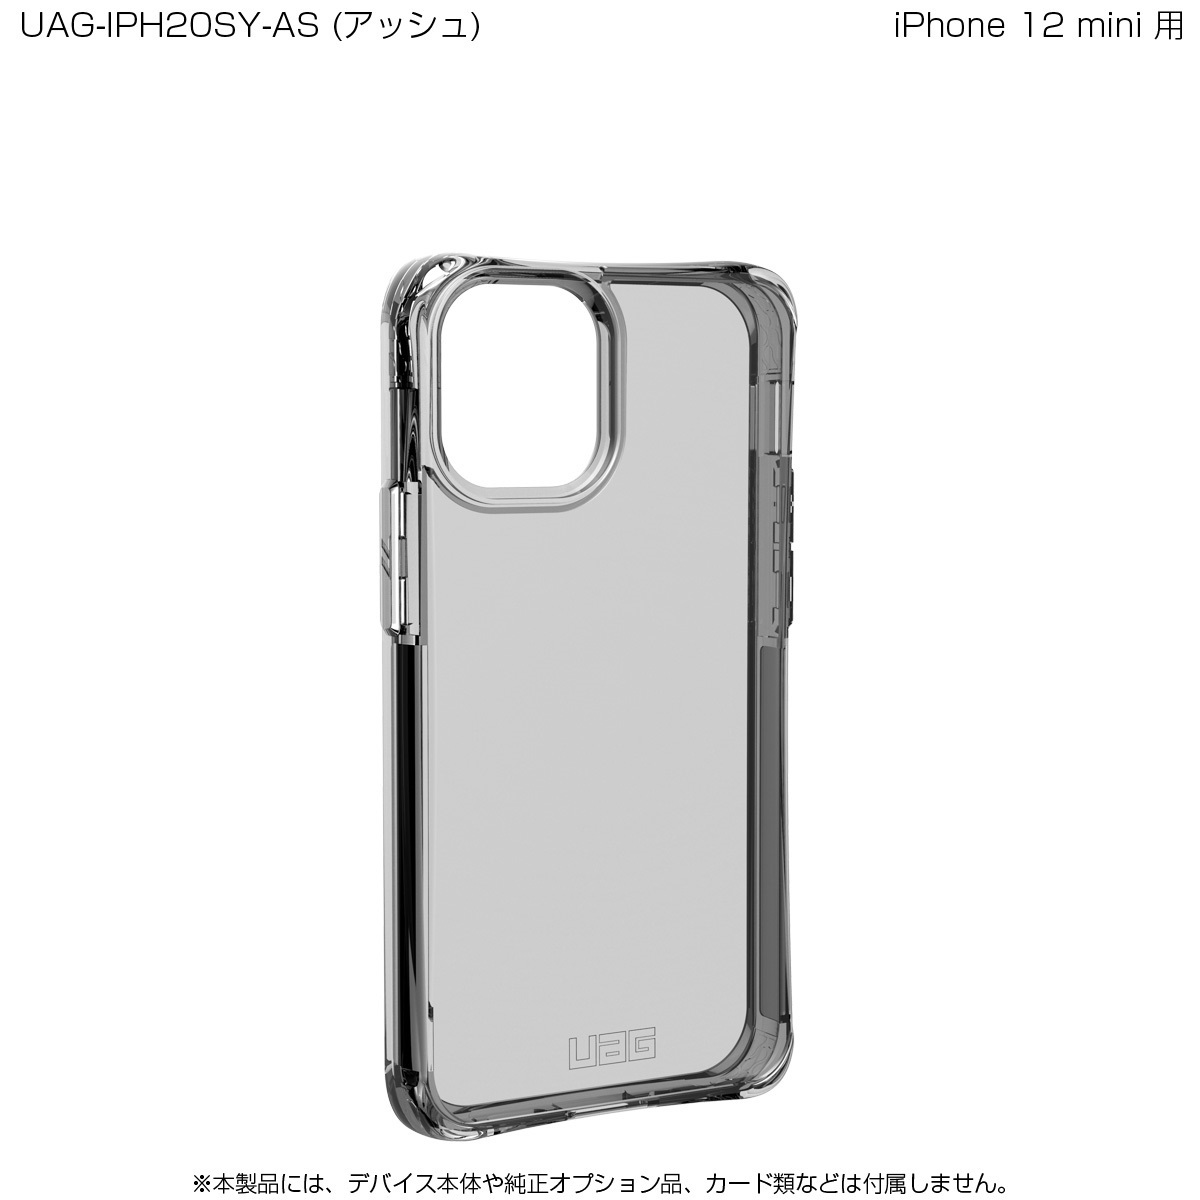 UAG iPhone 12 mini用 PLYOケース シンプル 全2色 耐衝撃 UAG-IPH20SYシリーズ 5.4インチ